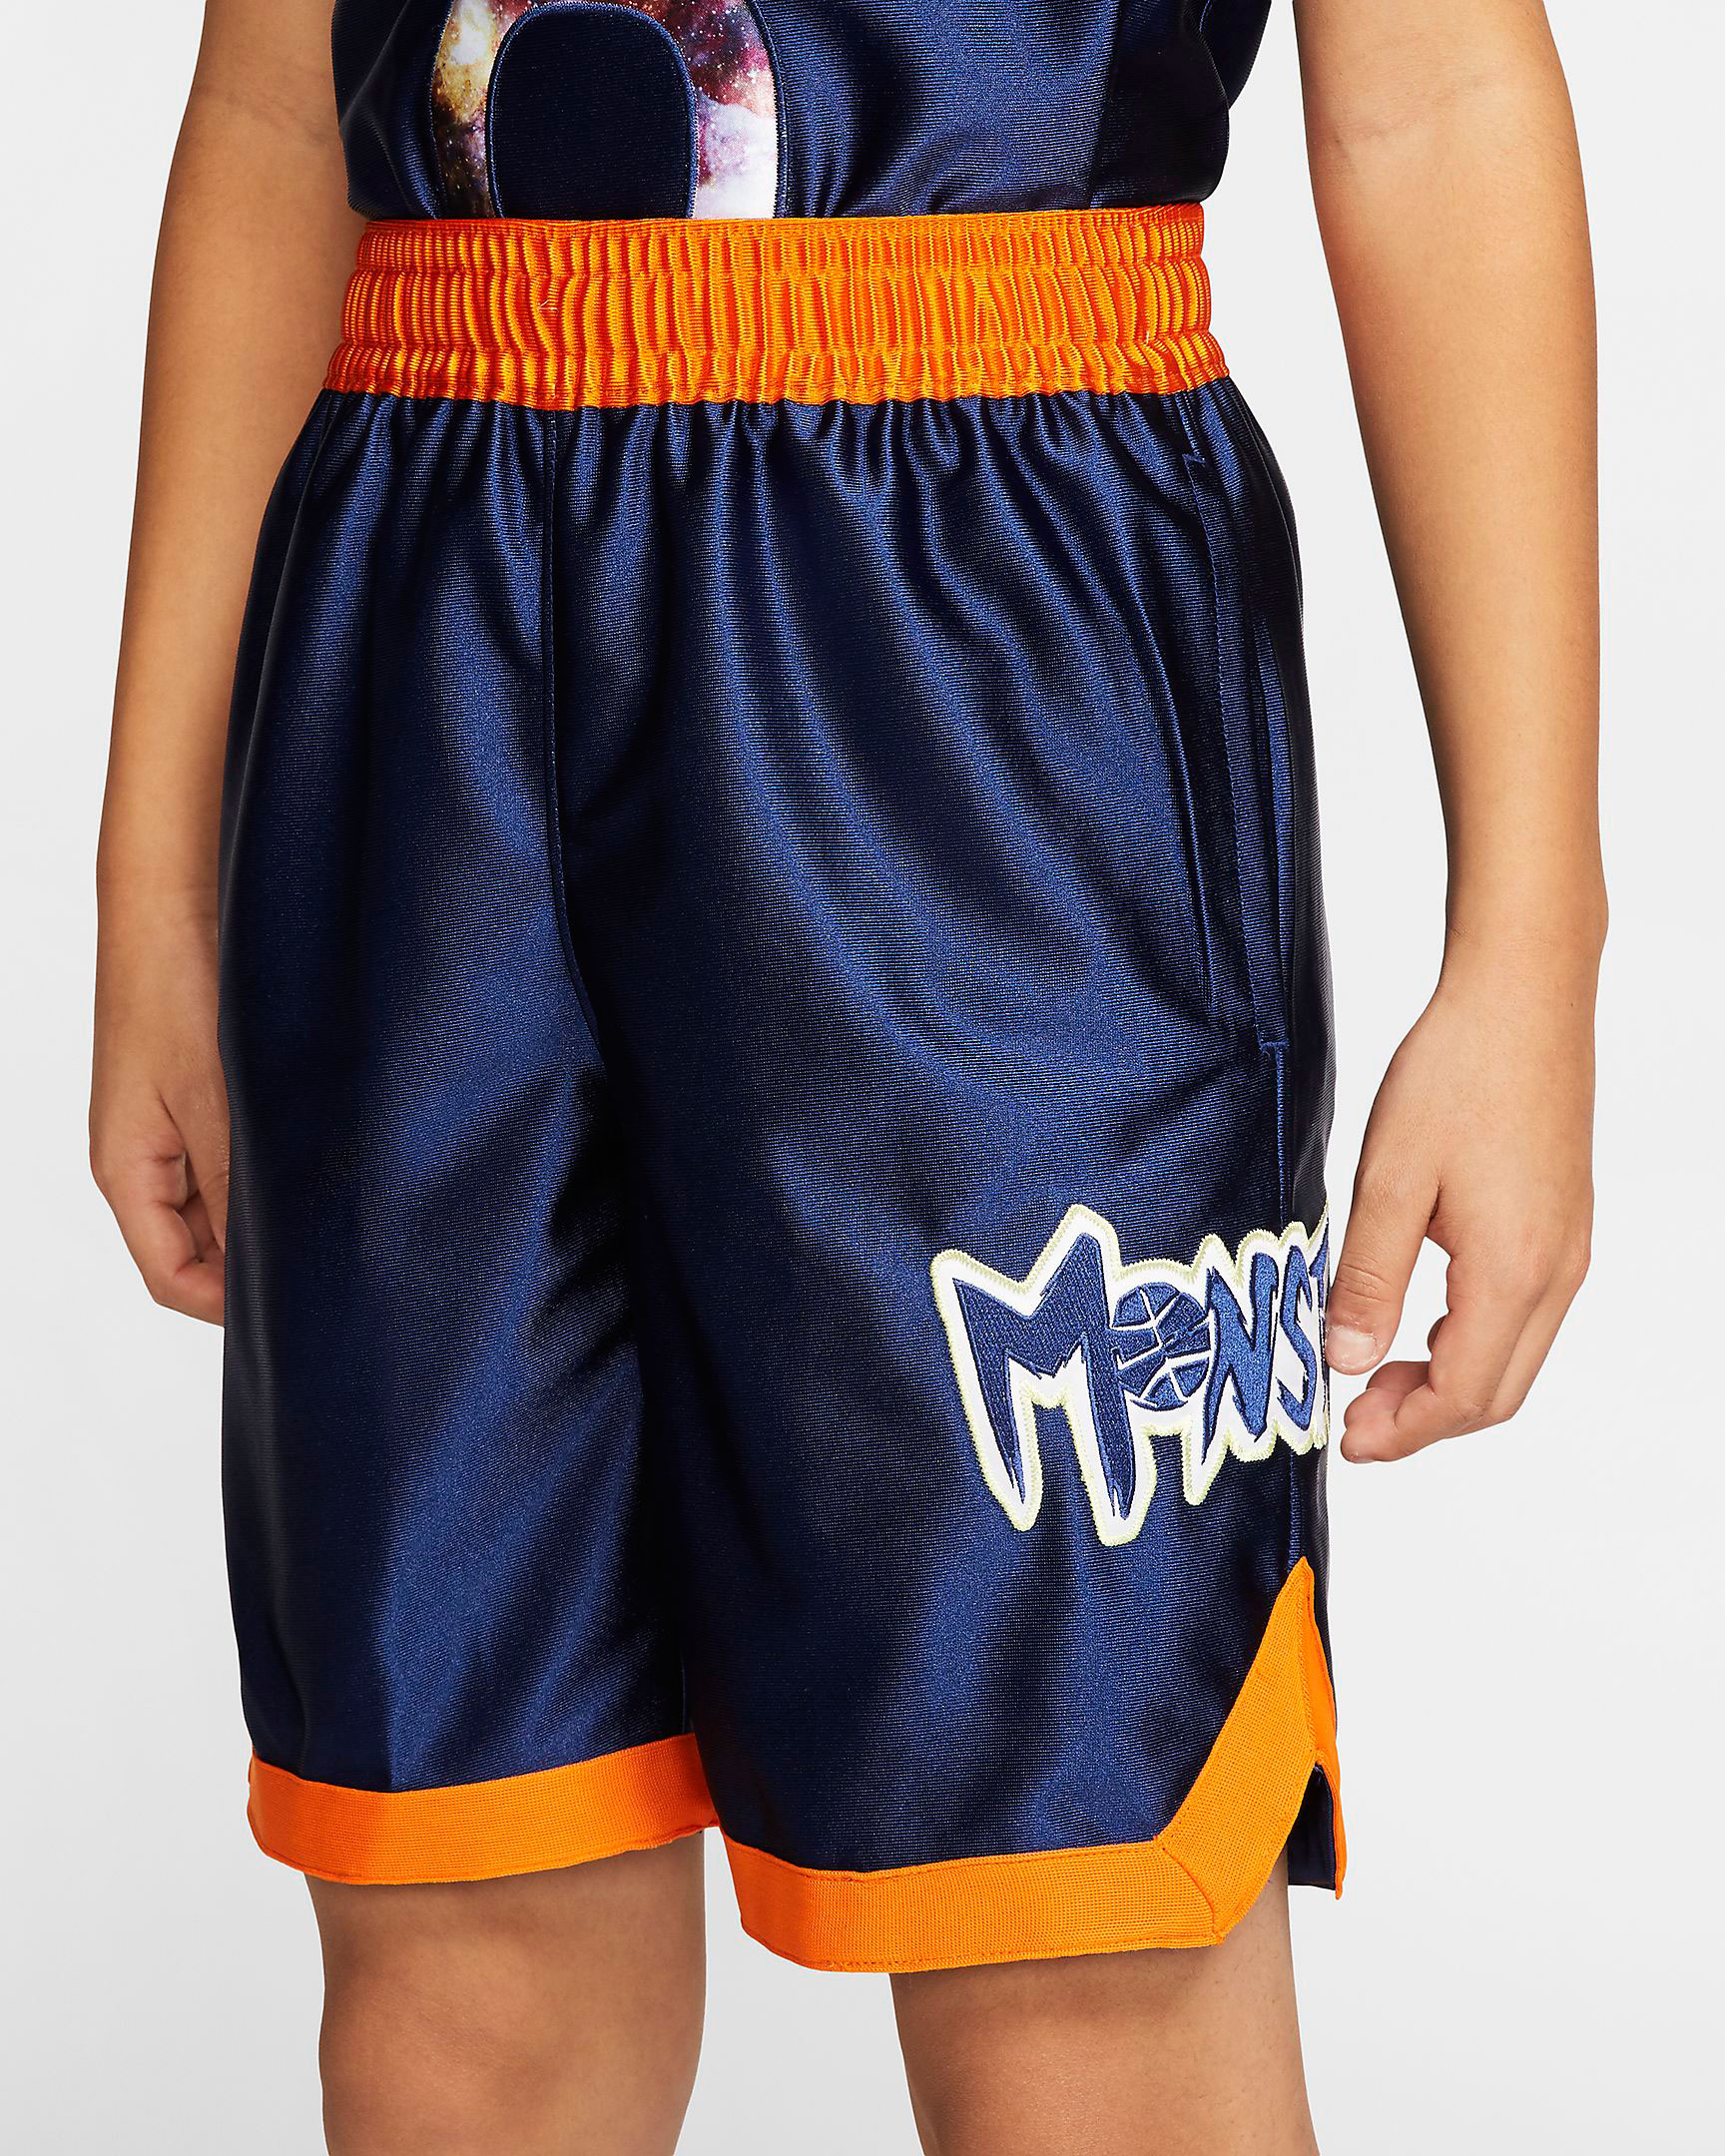 nike-lebron-monstars-kids-shorts-1